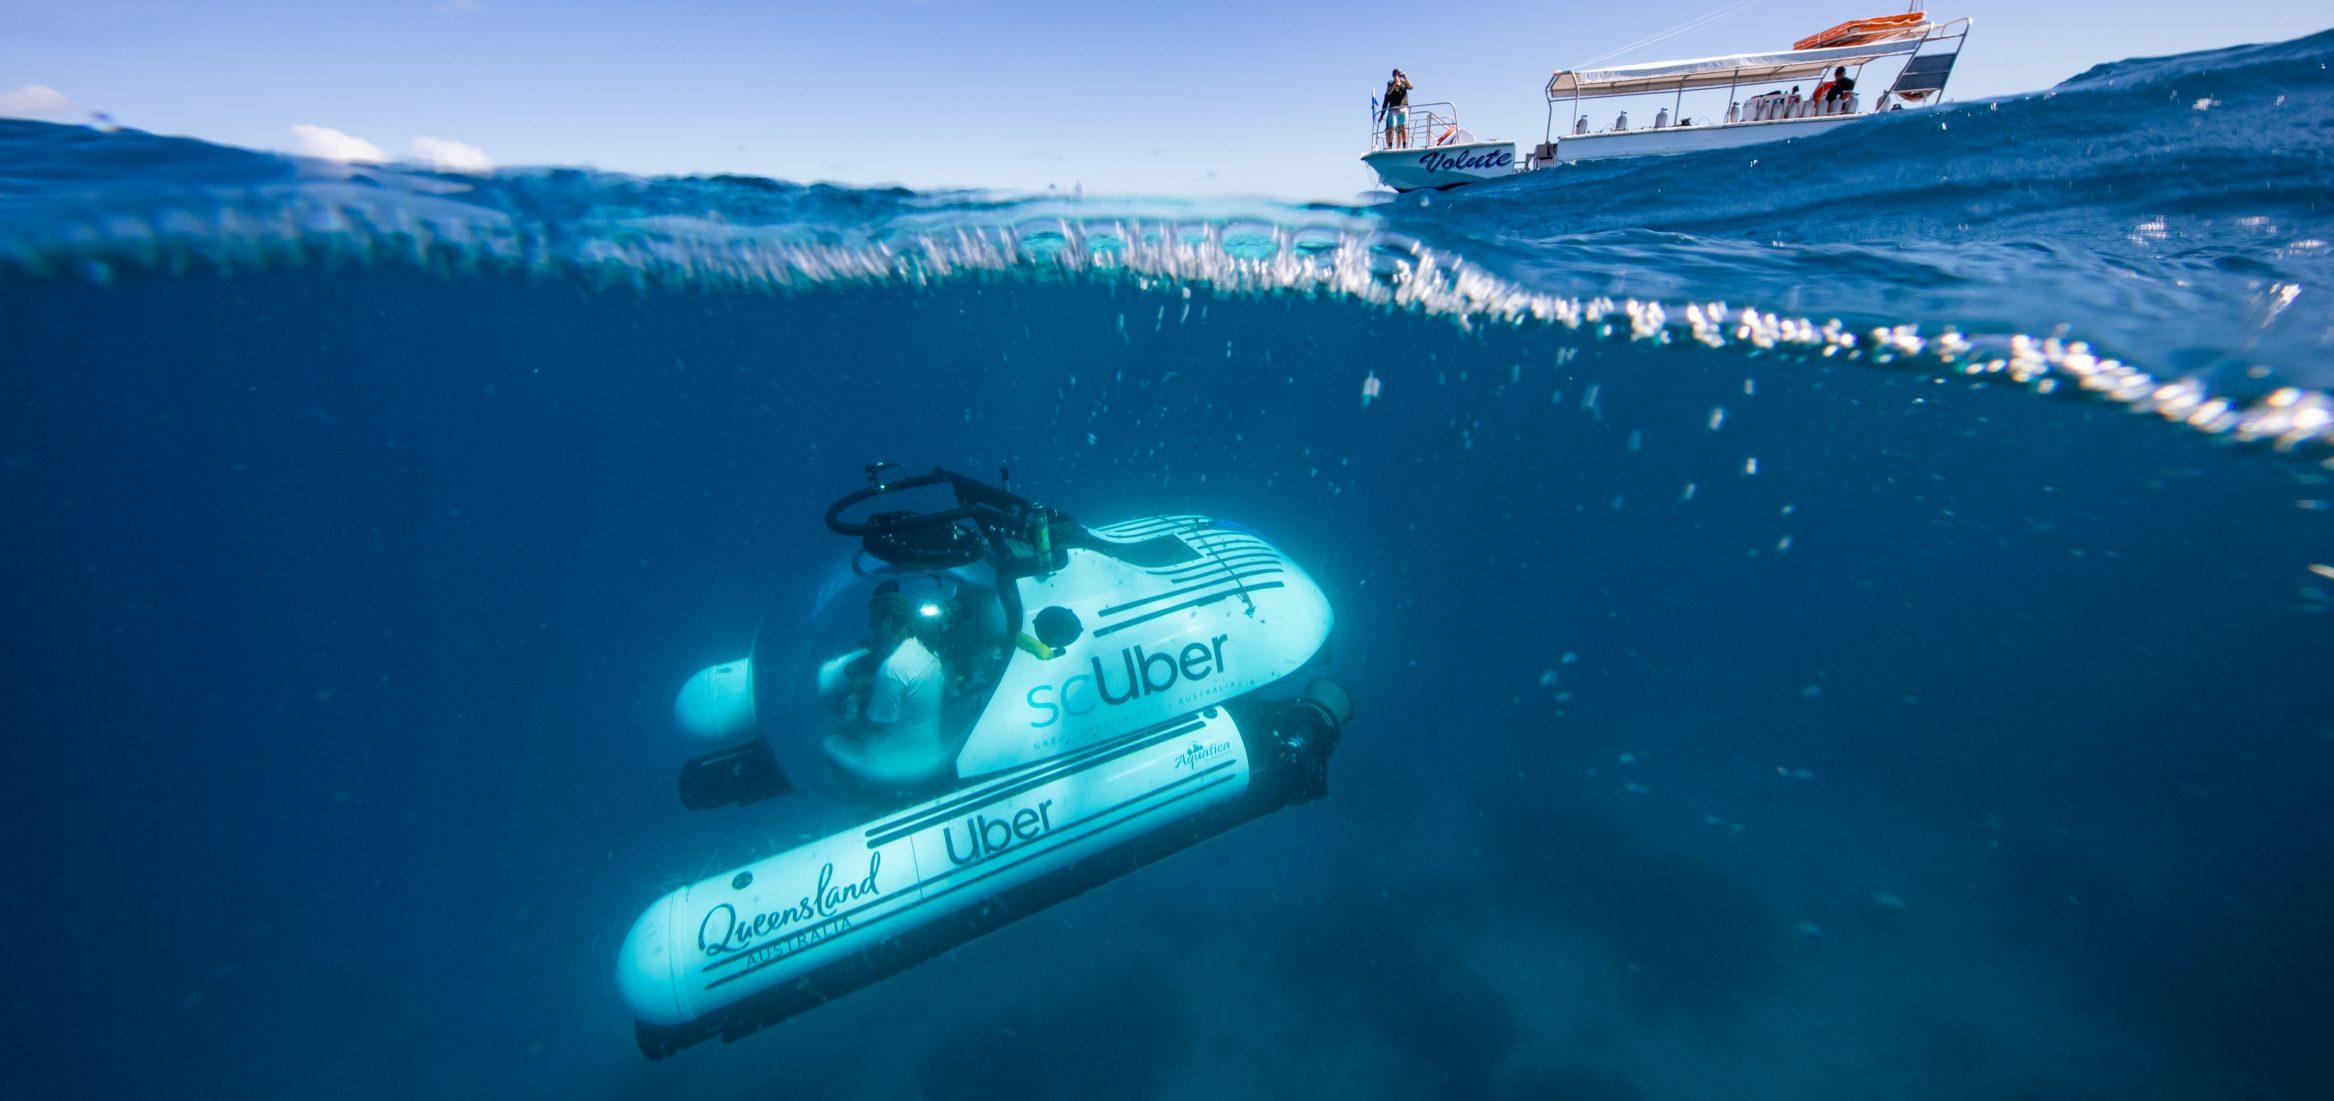 scUber-descending-Heron-Island-Credit-Tourism-and-Events-Queensland